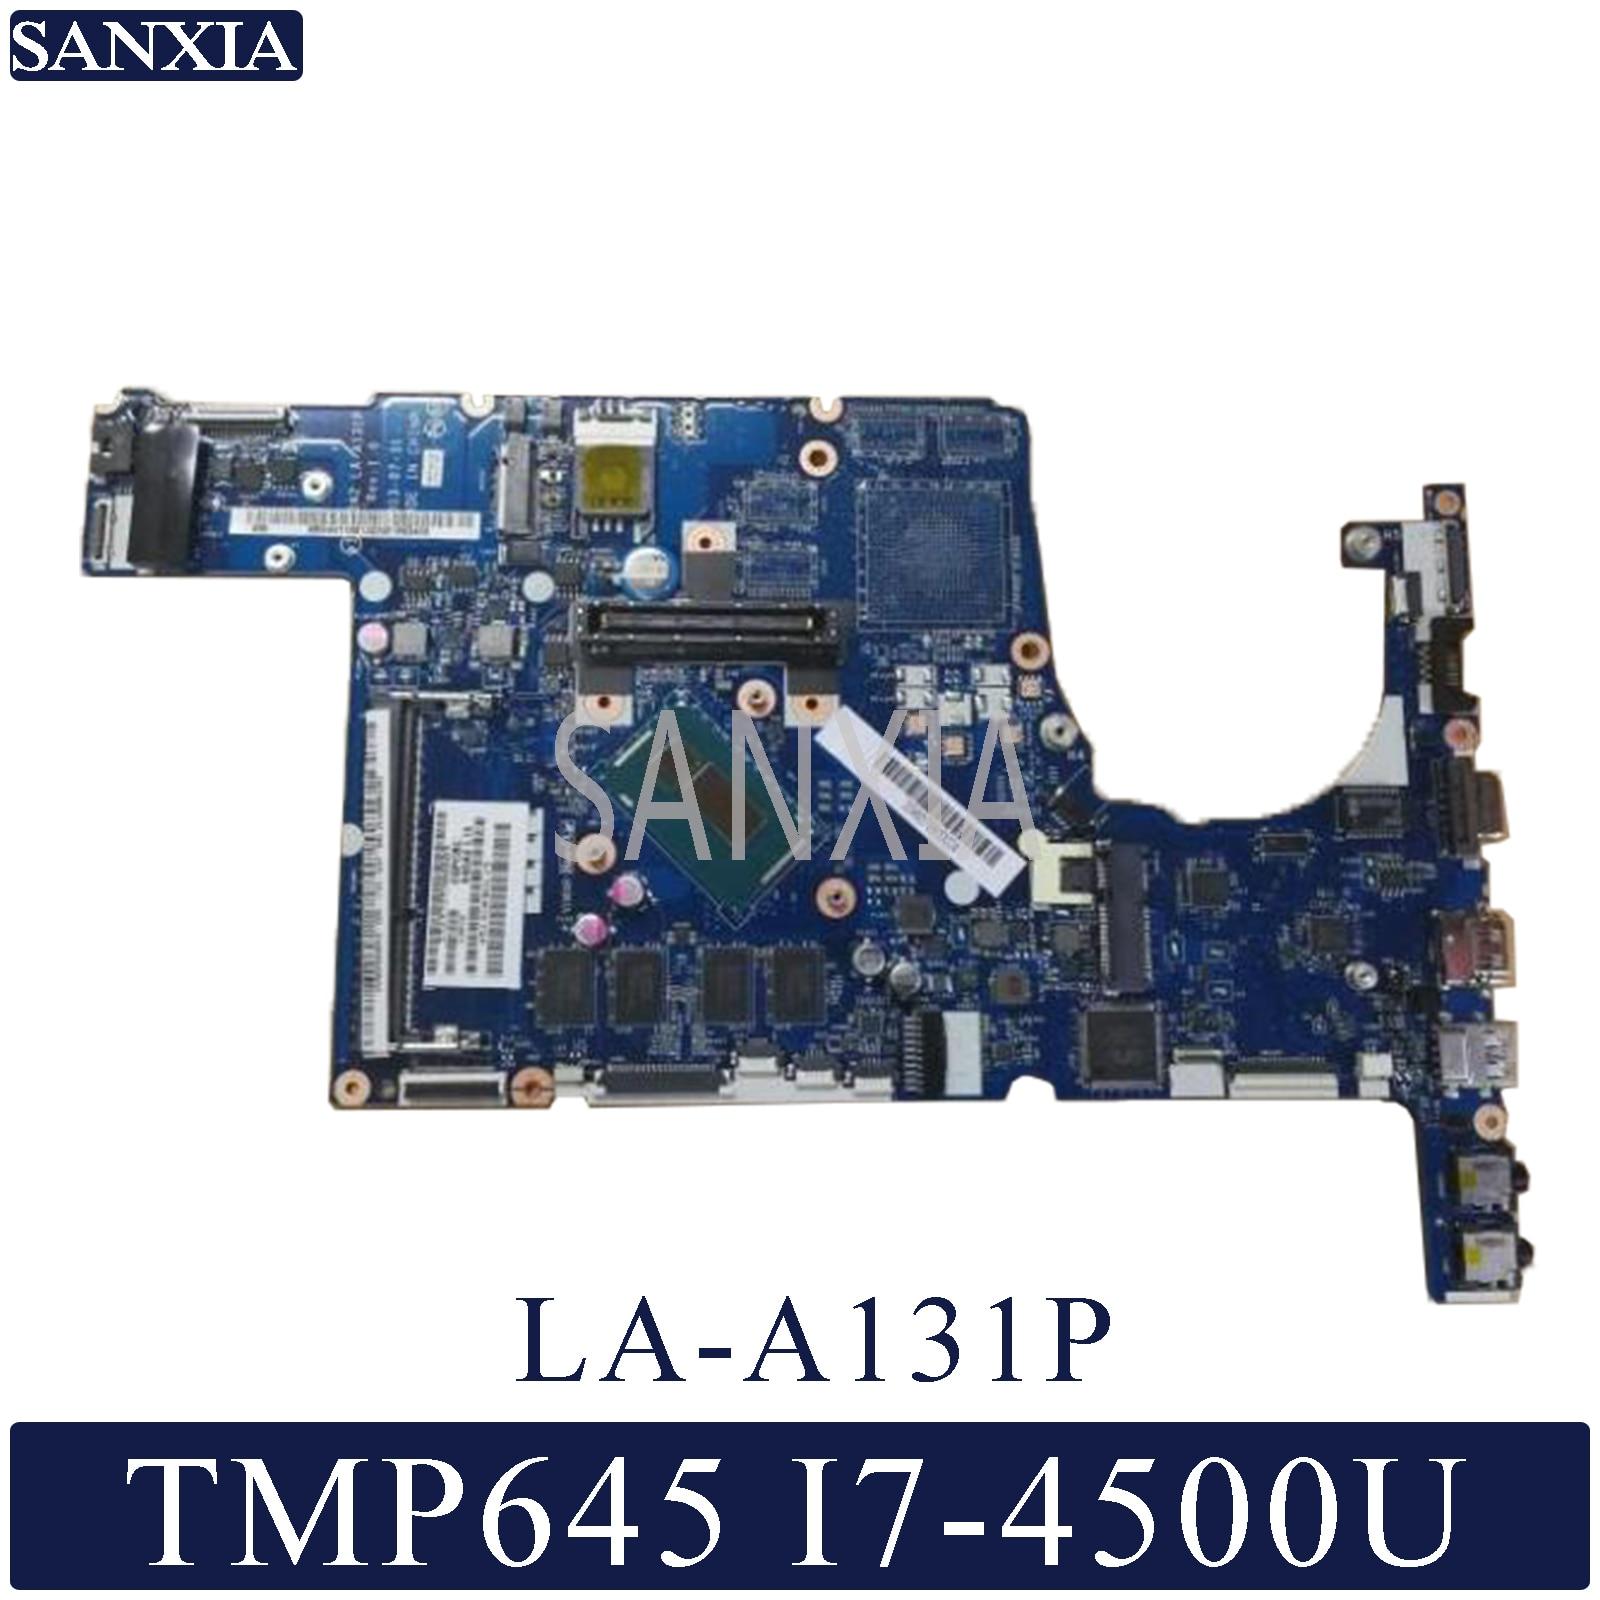 KEFU LA-A131P اللوحة لابتوب أيسر TMP645-MG Travelmate-P645 اللوحة الأصلية 4GB-RAM I7-4500U